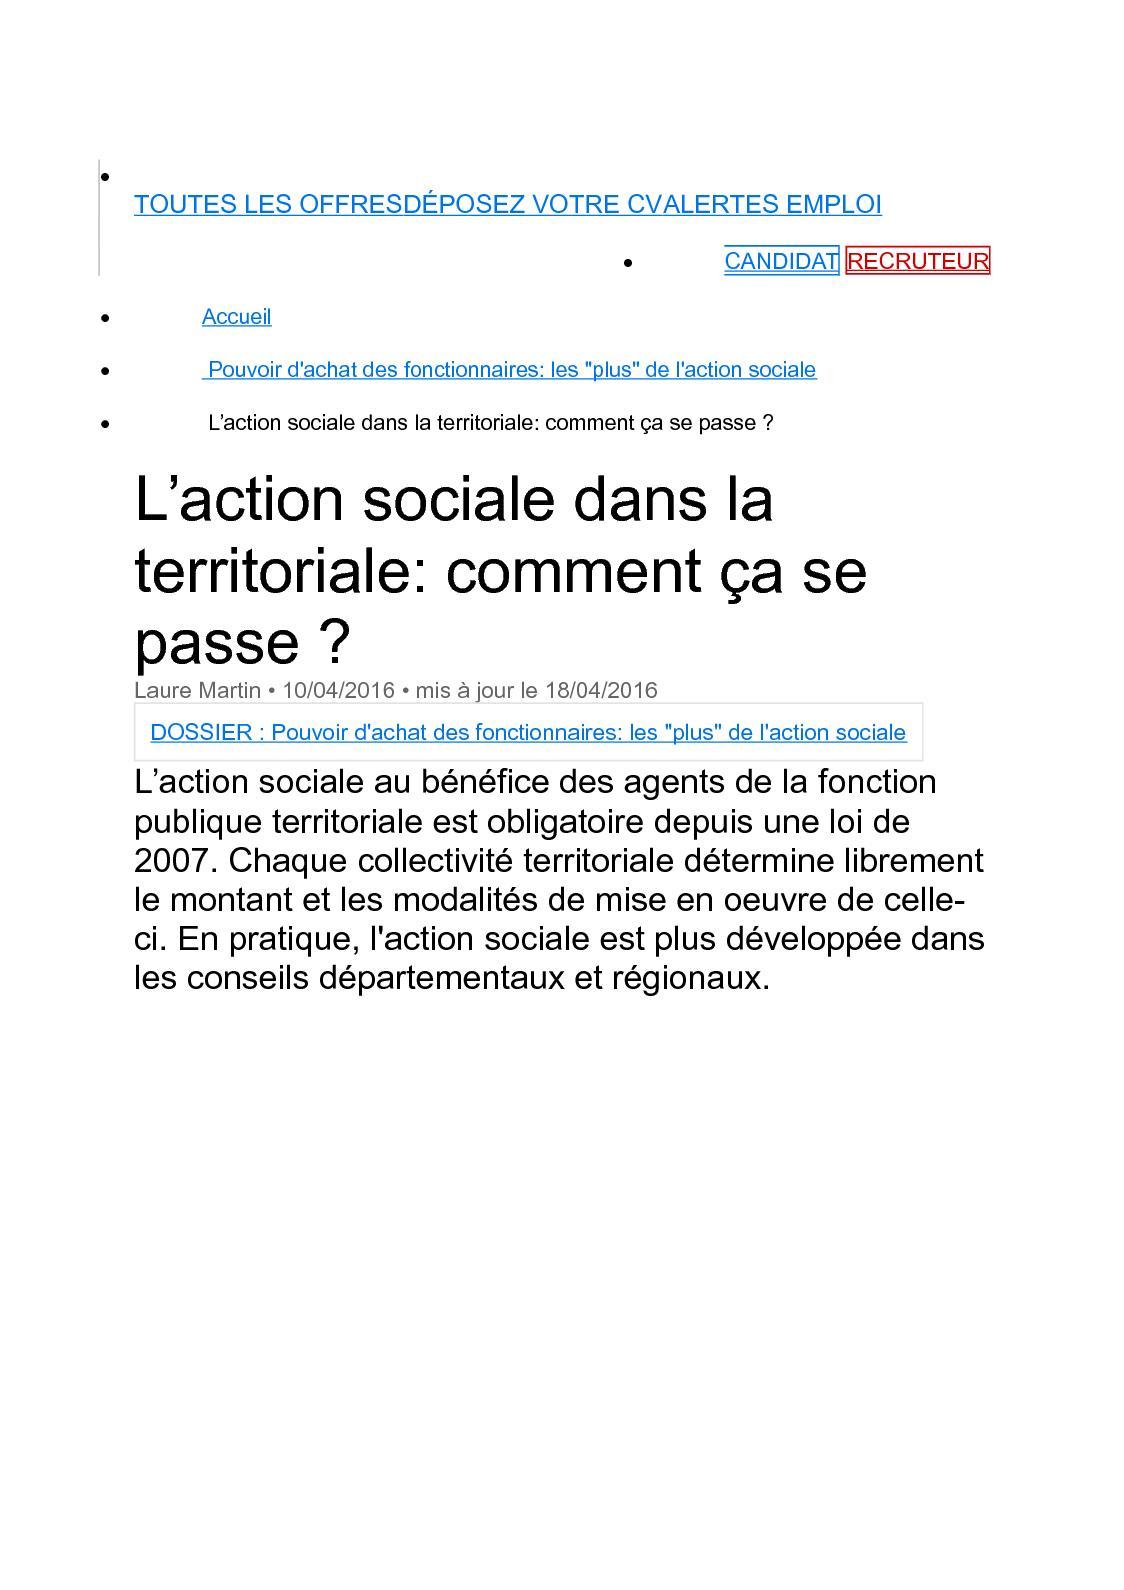 9ac5208cc6d Calaméo - Oeuvres Sociales Territoriales